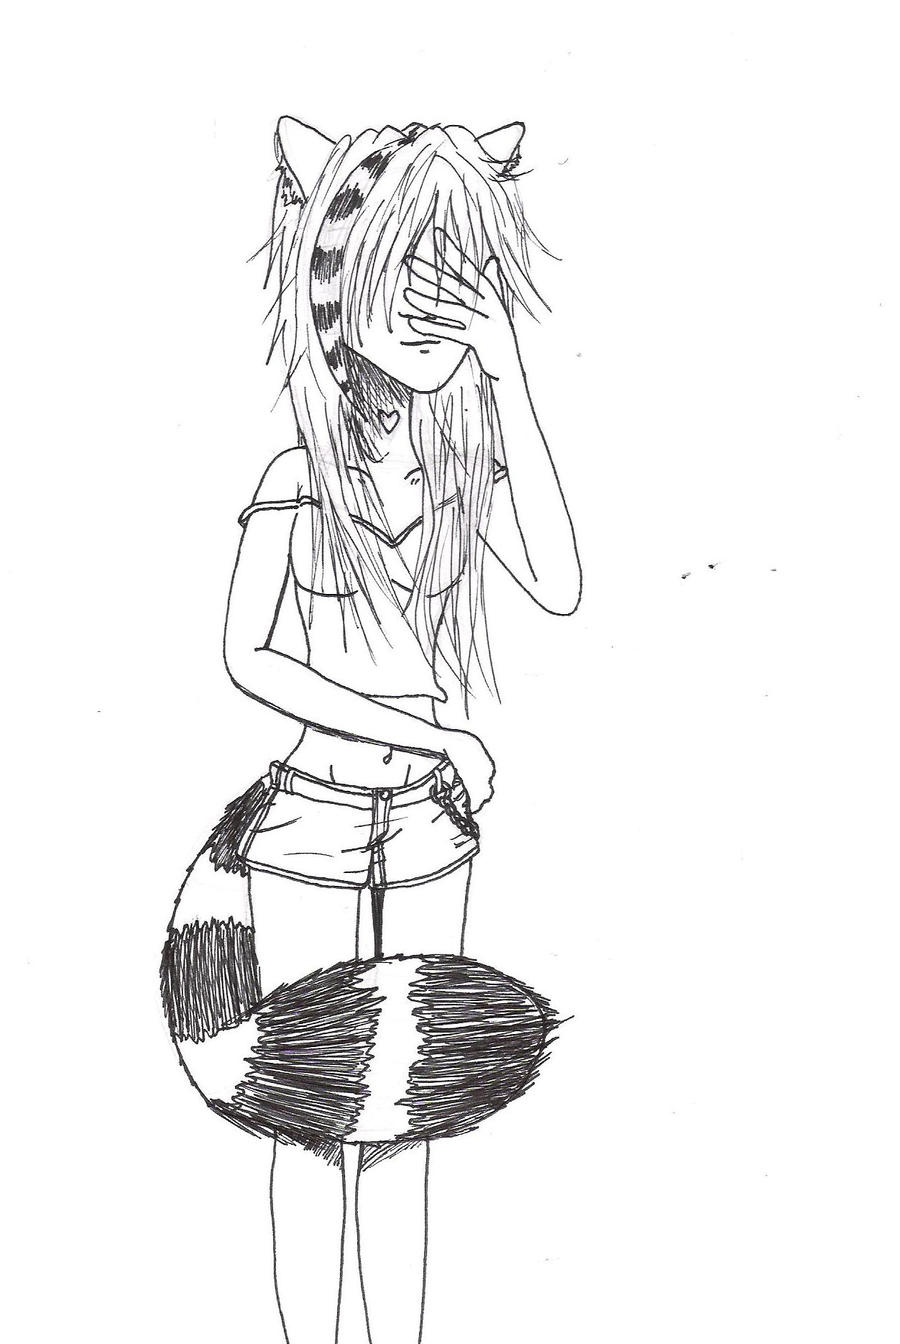 Kat Request Sketch by BakaShinagami